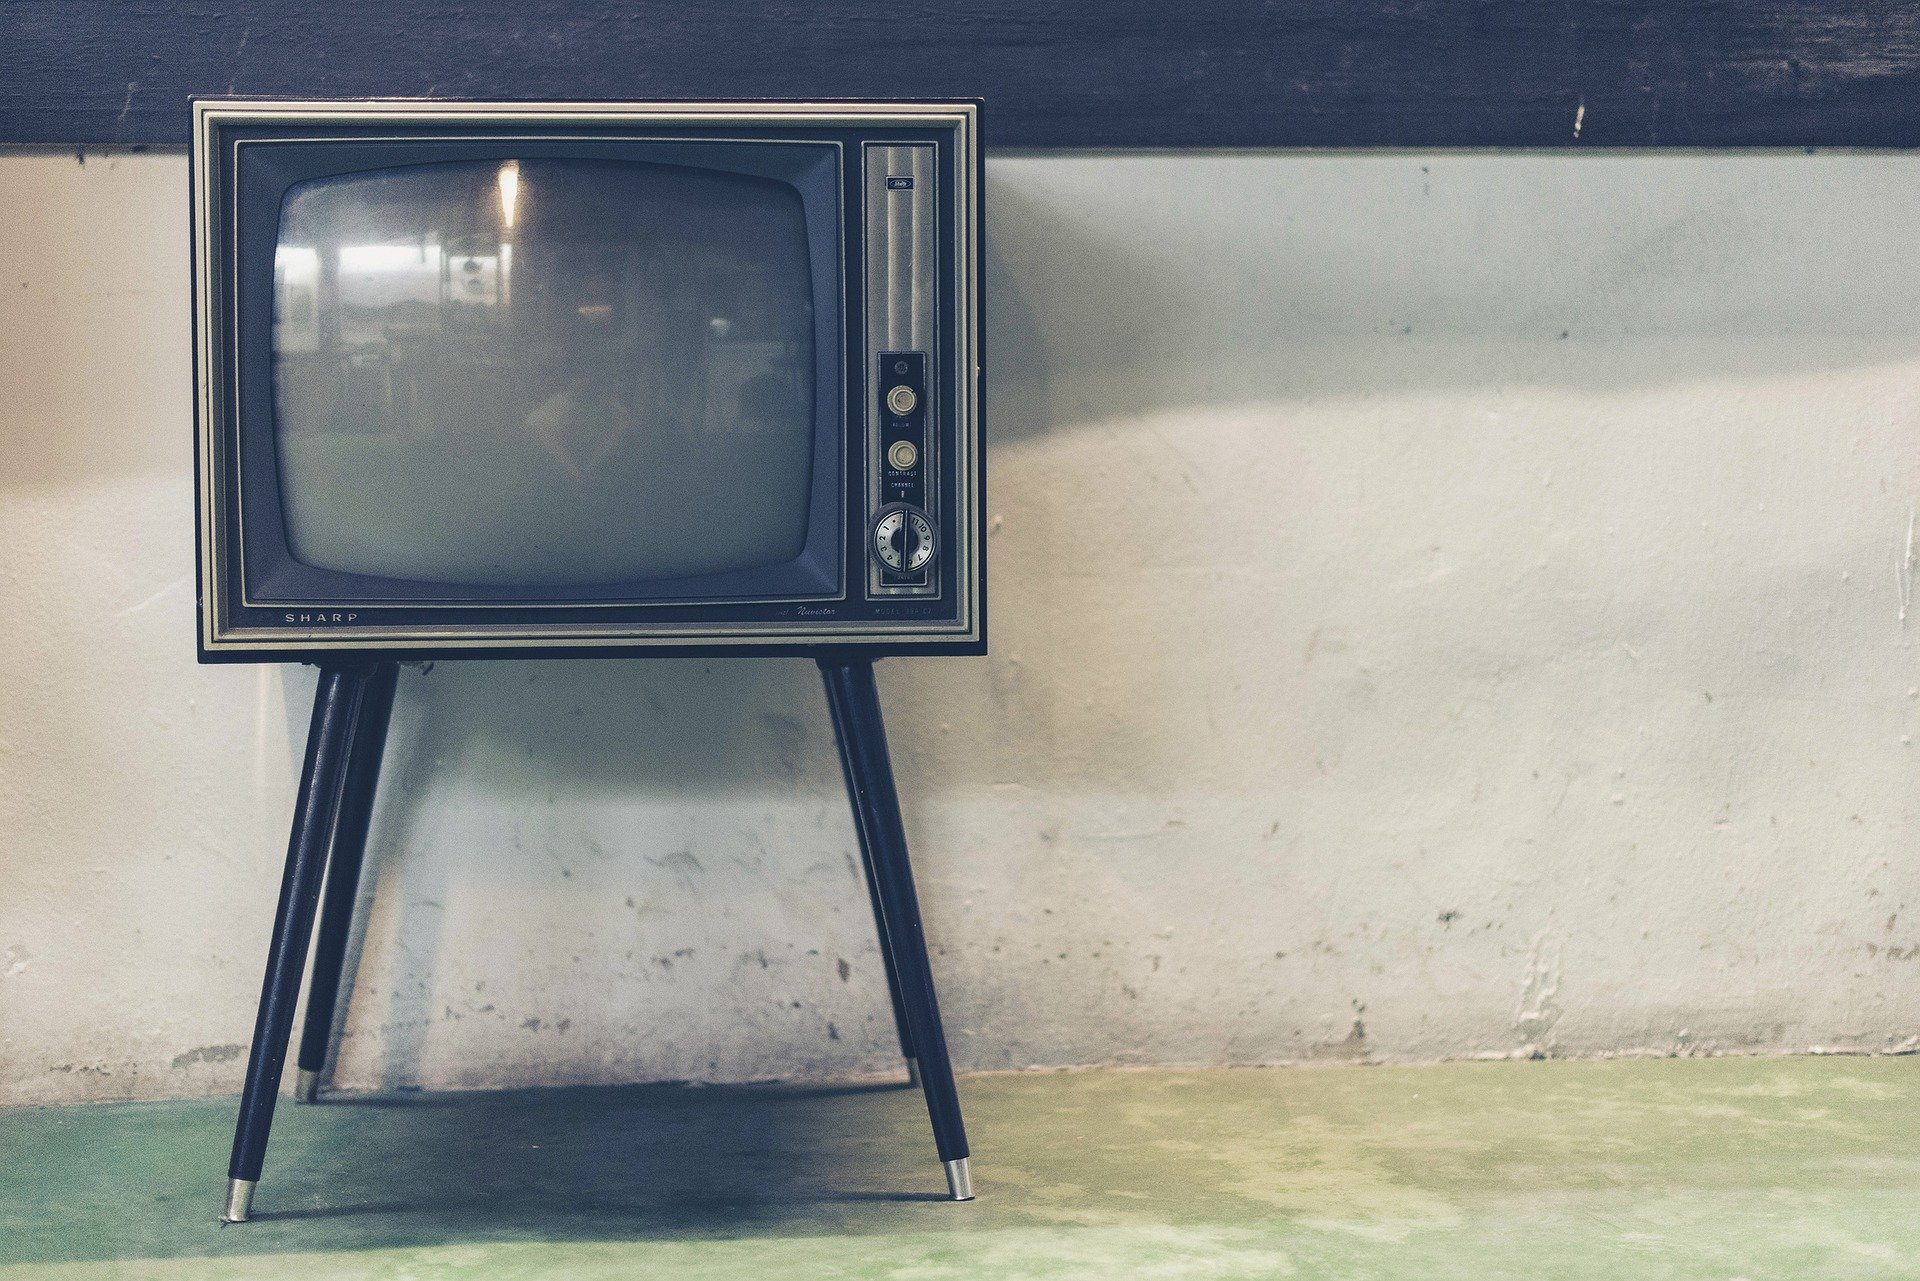 come richiedere bonus tv